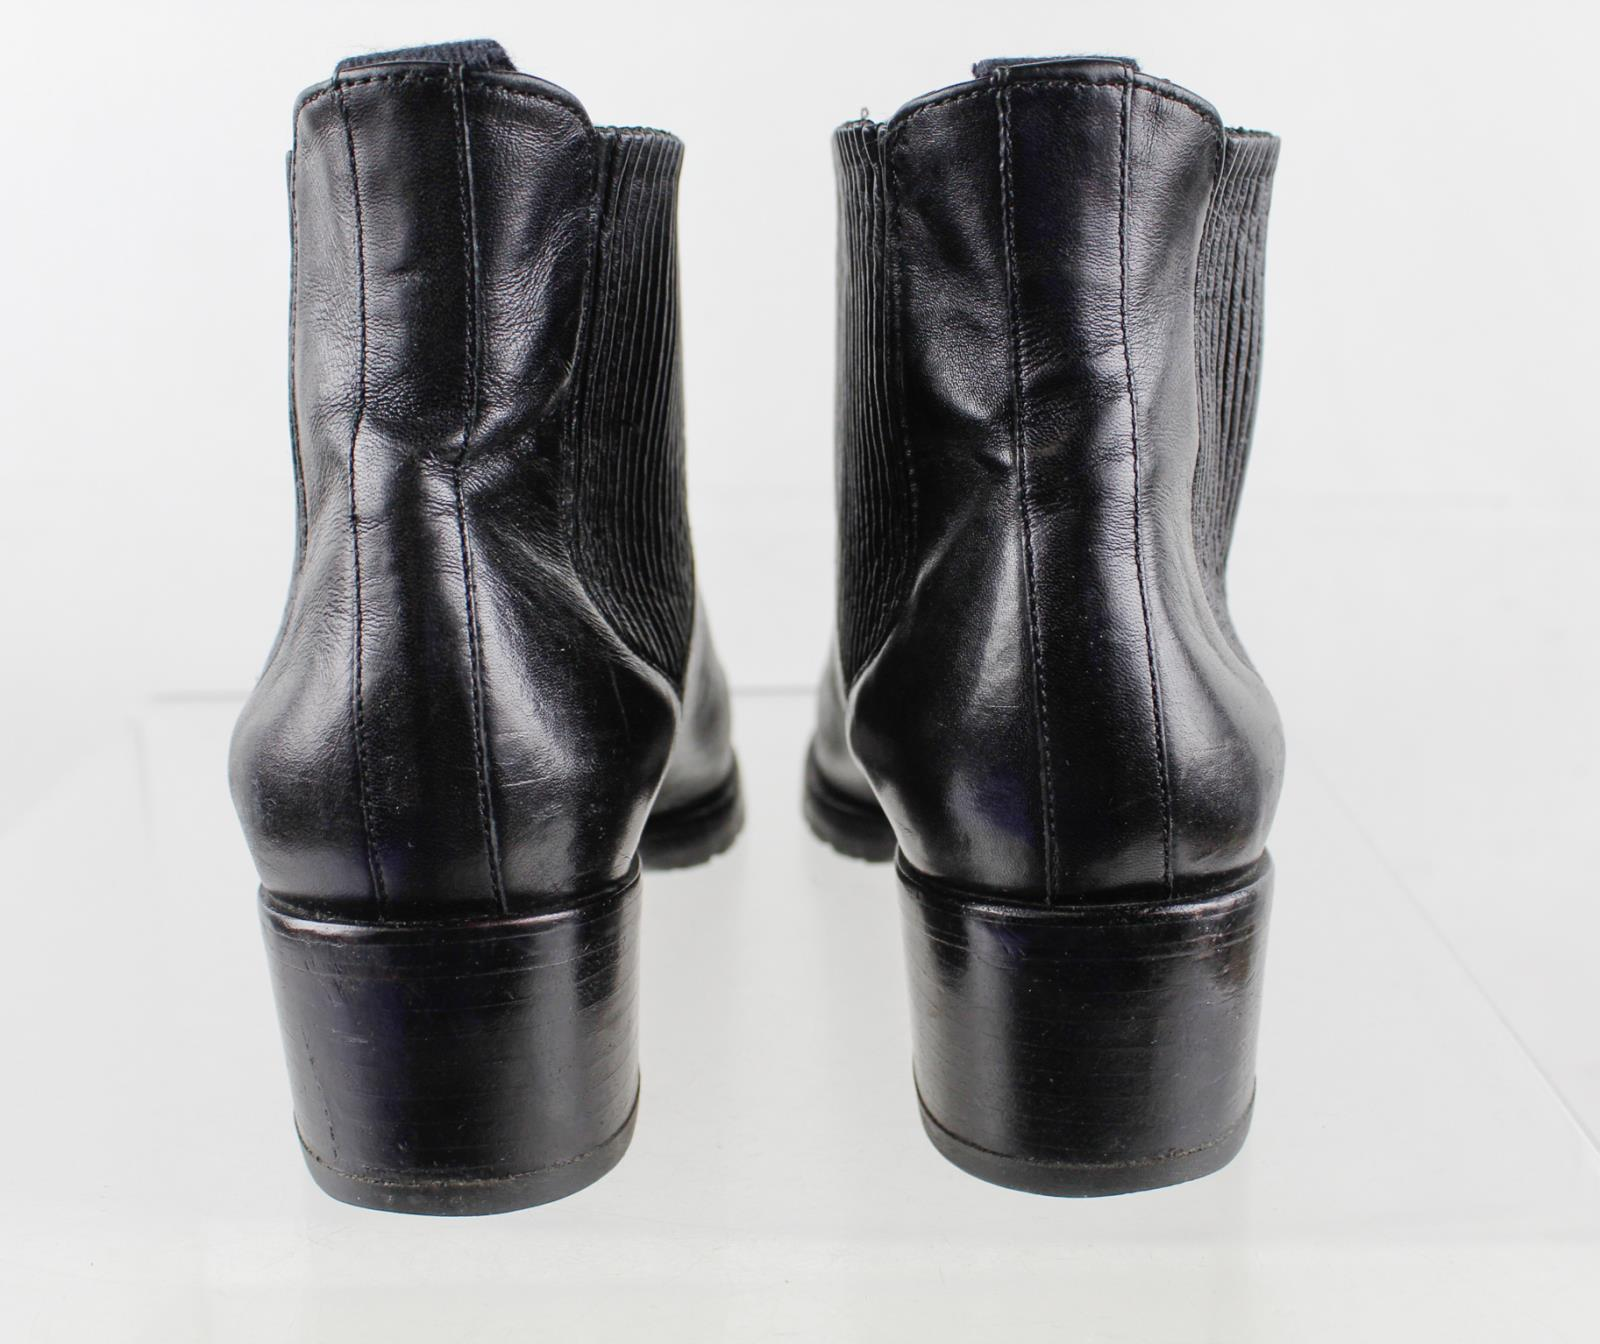 Cole Haan Black Leather Women's Chelsea Boots Size 5.5B | eBay